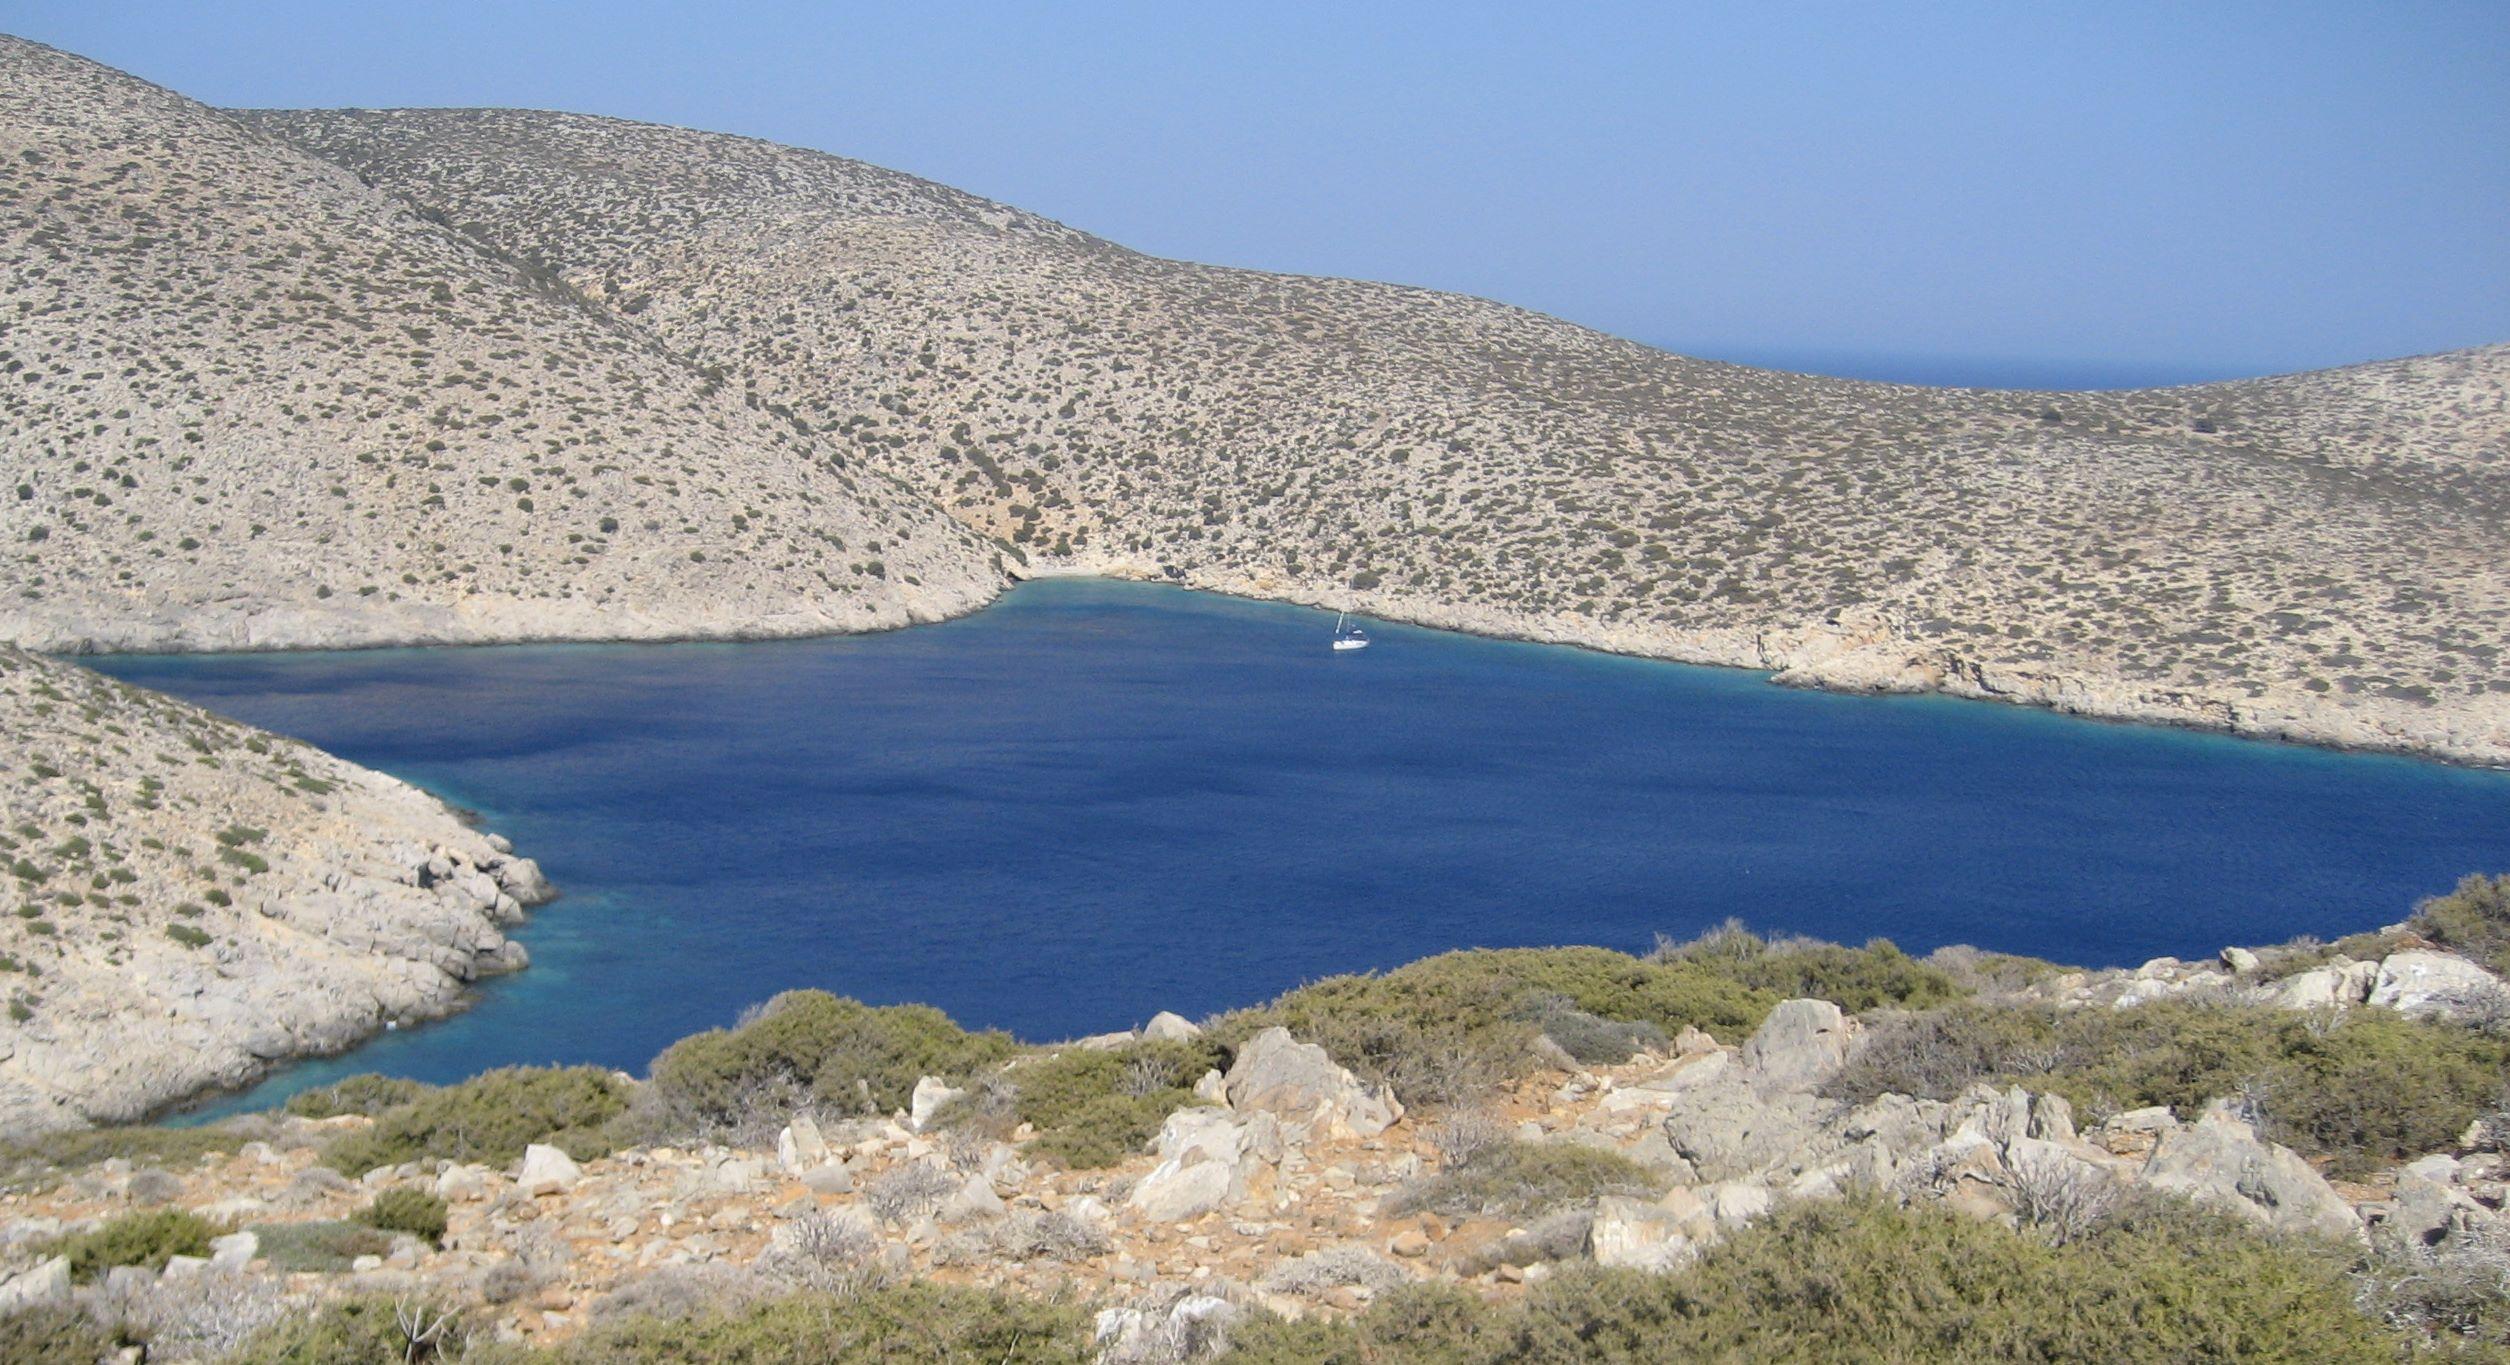 http://www.esys.org/rev_info/Griechenland/Syrna_Suedbucht-hq.jpg